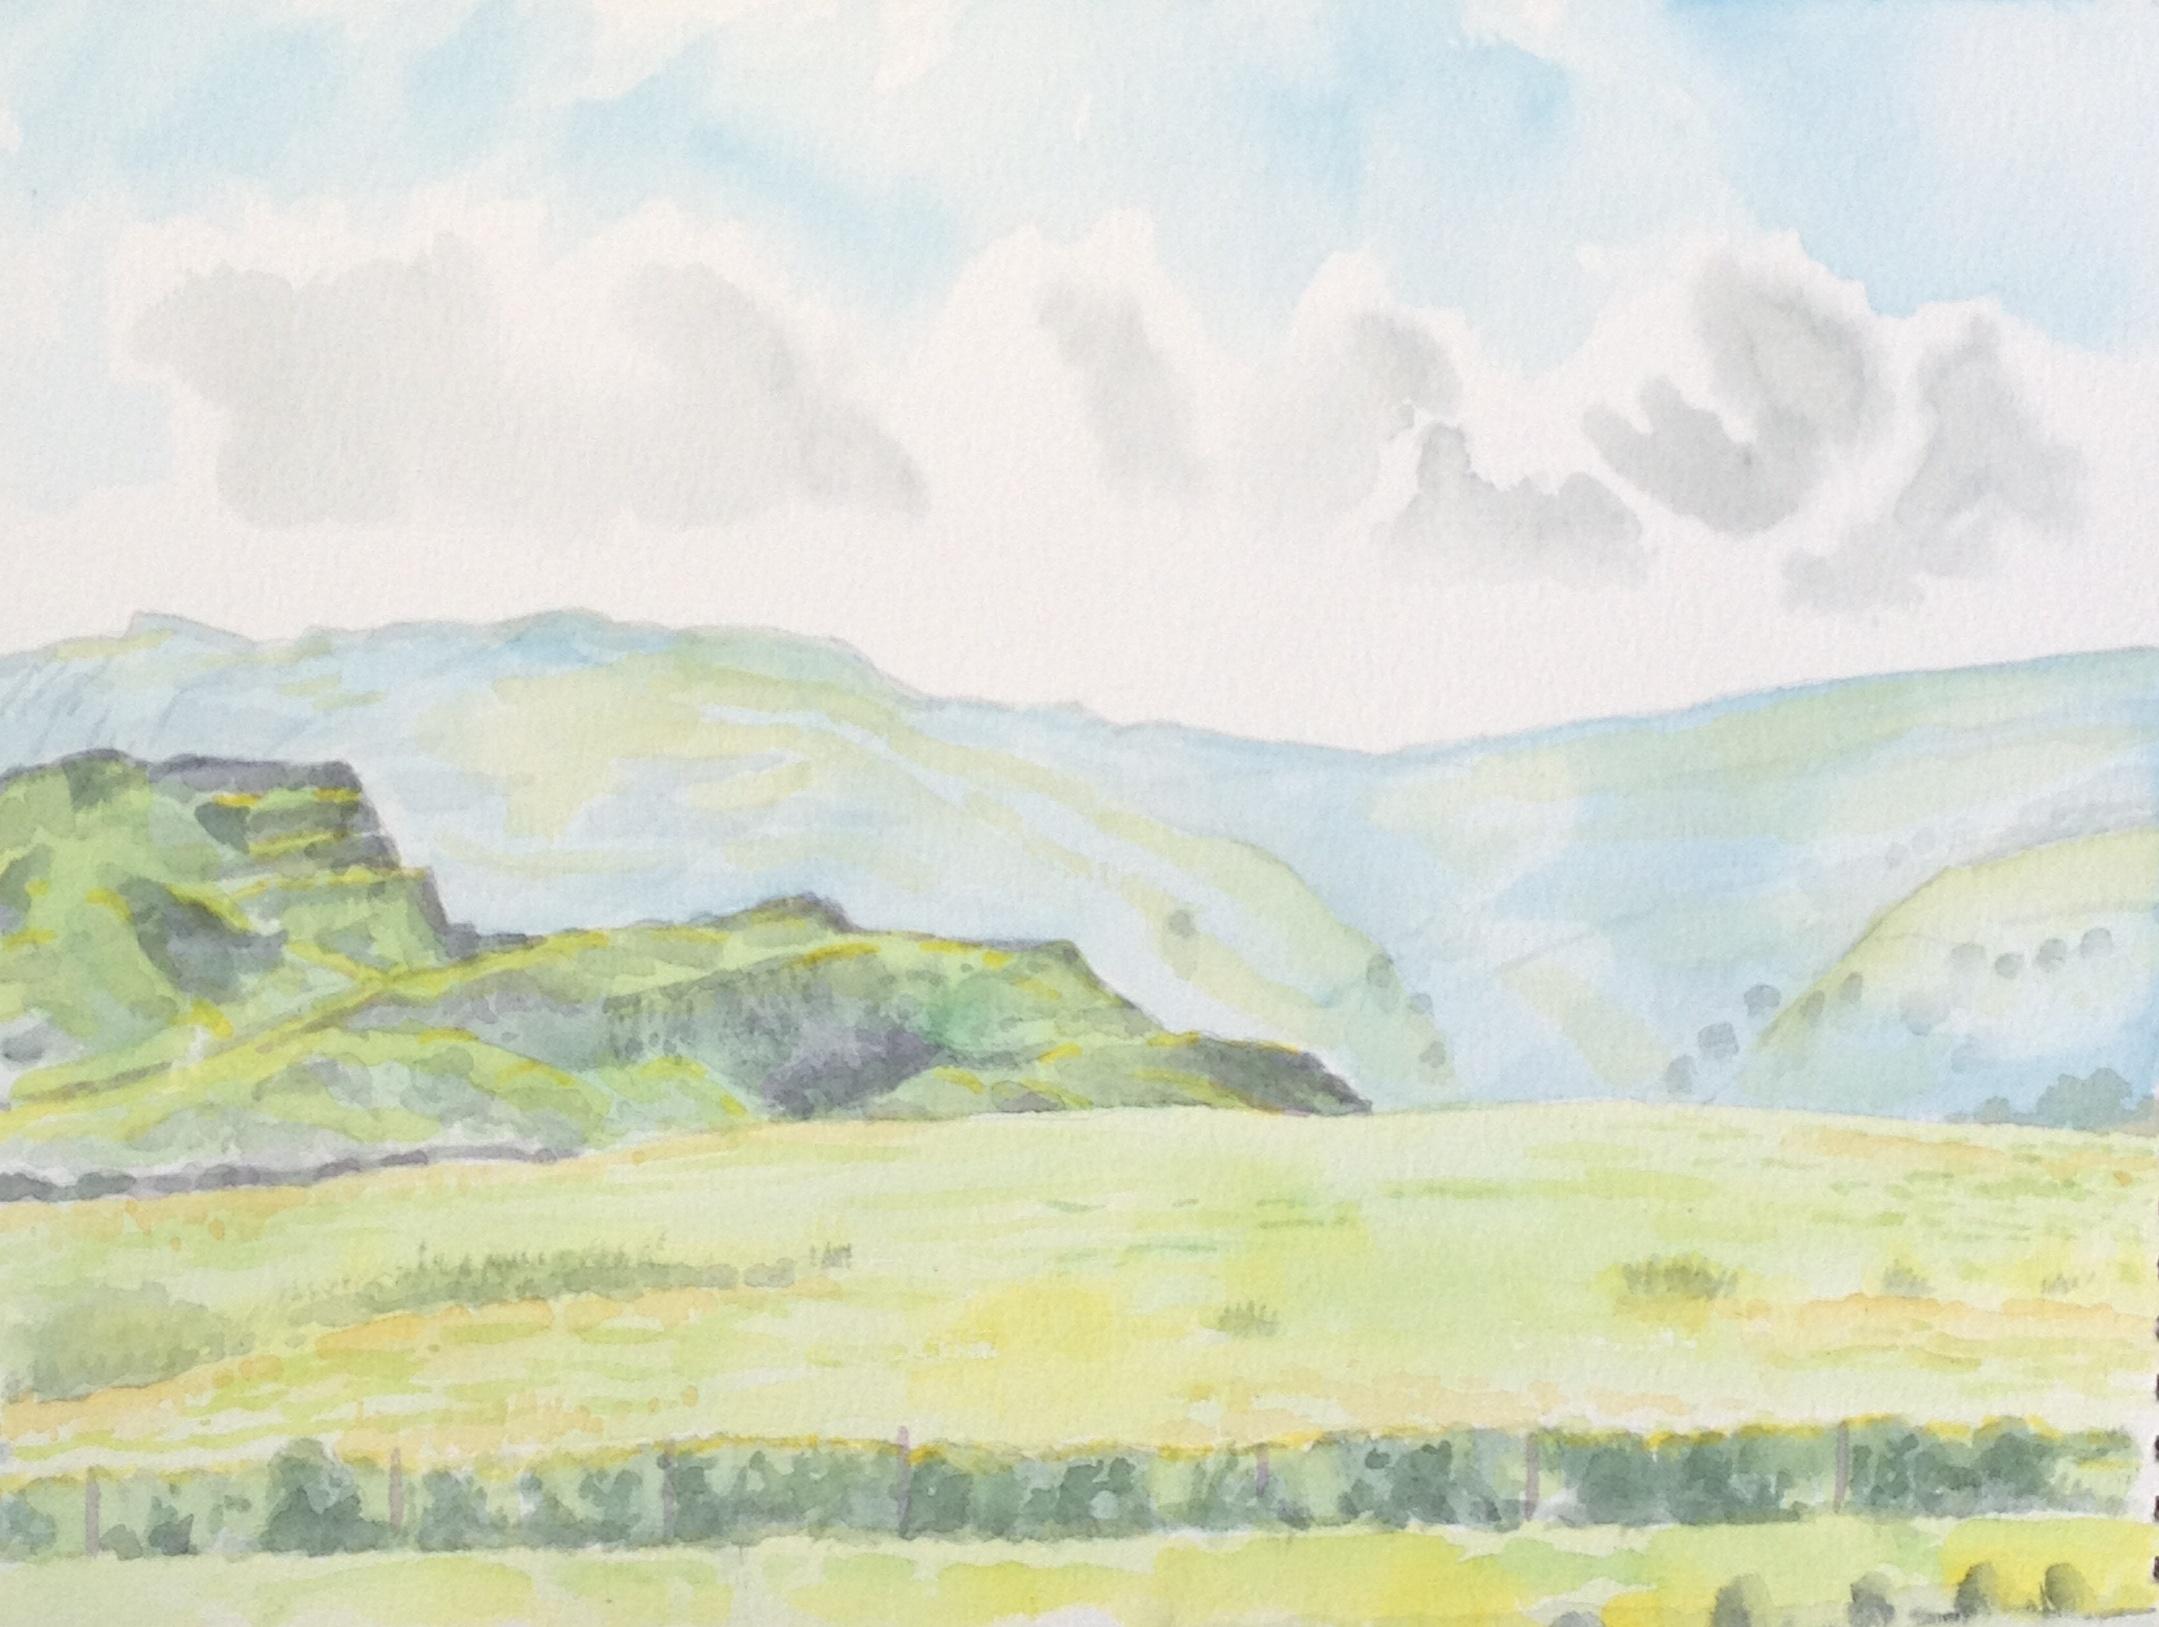 'Penwyllt' watercolour on paper (2013)